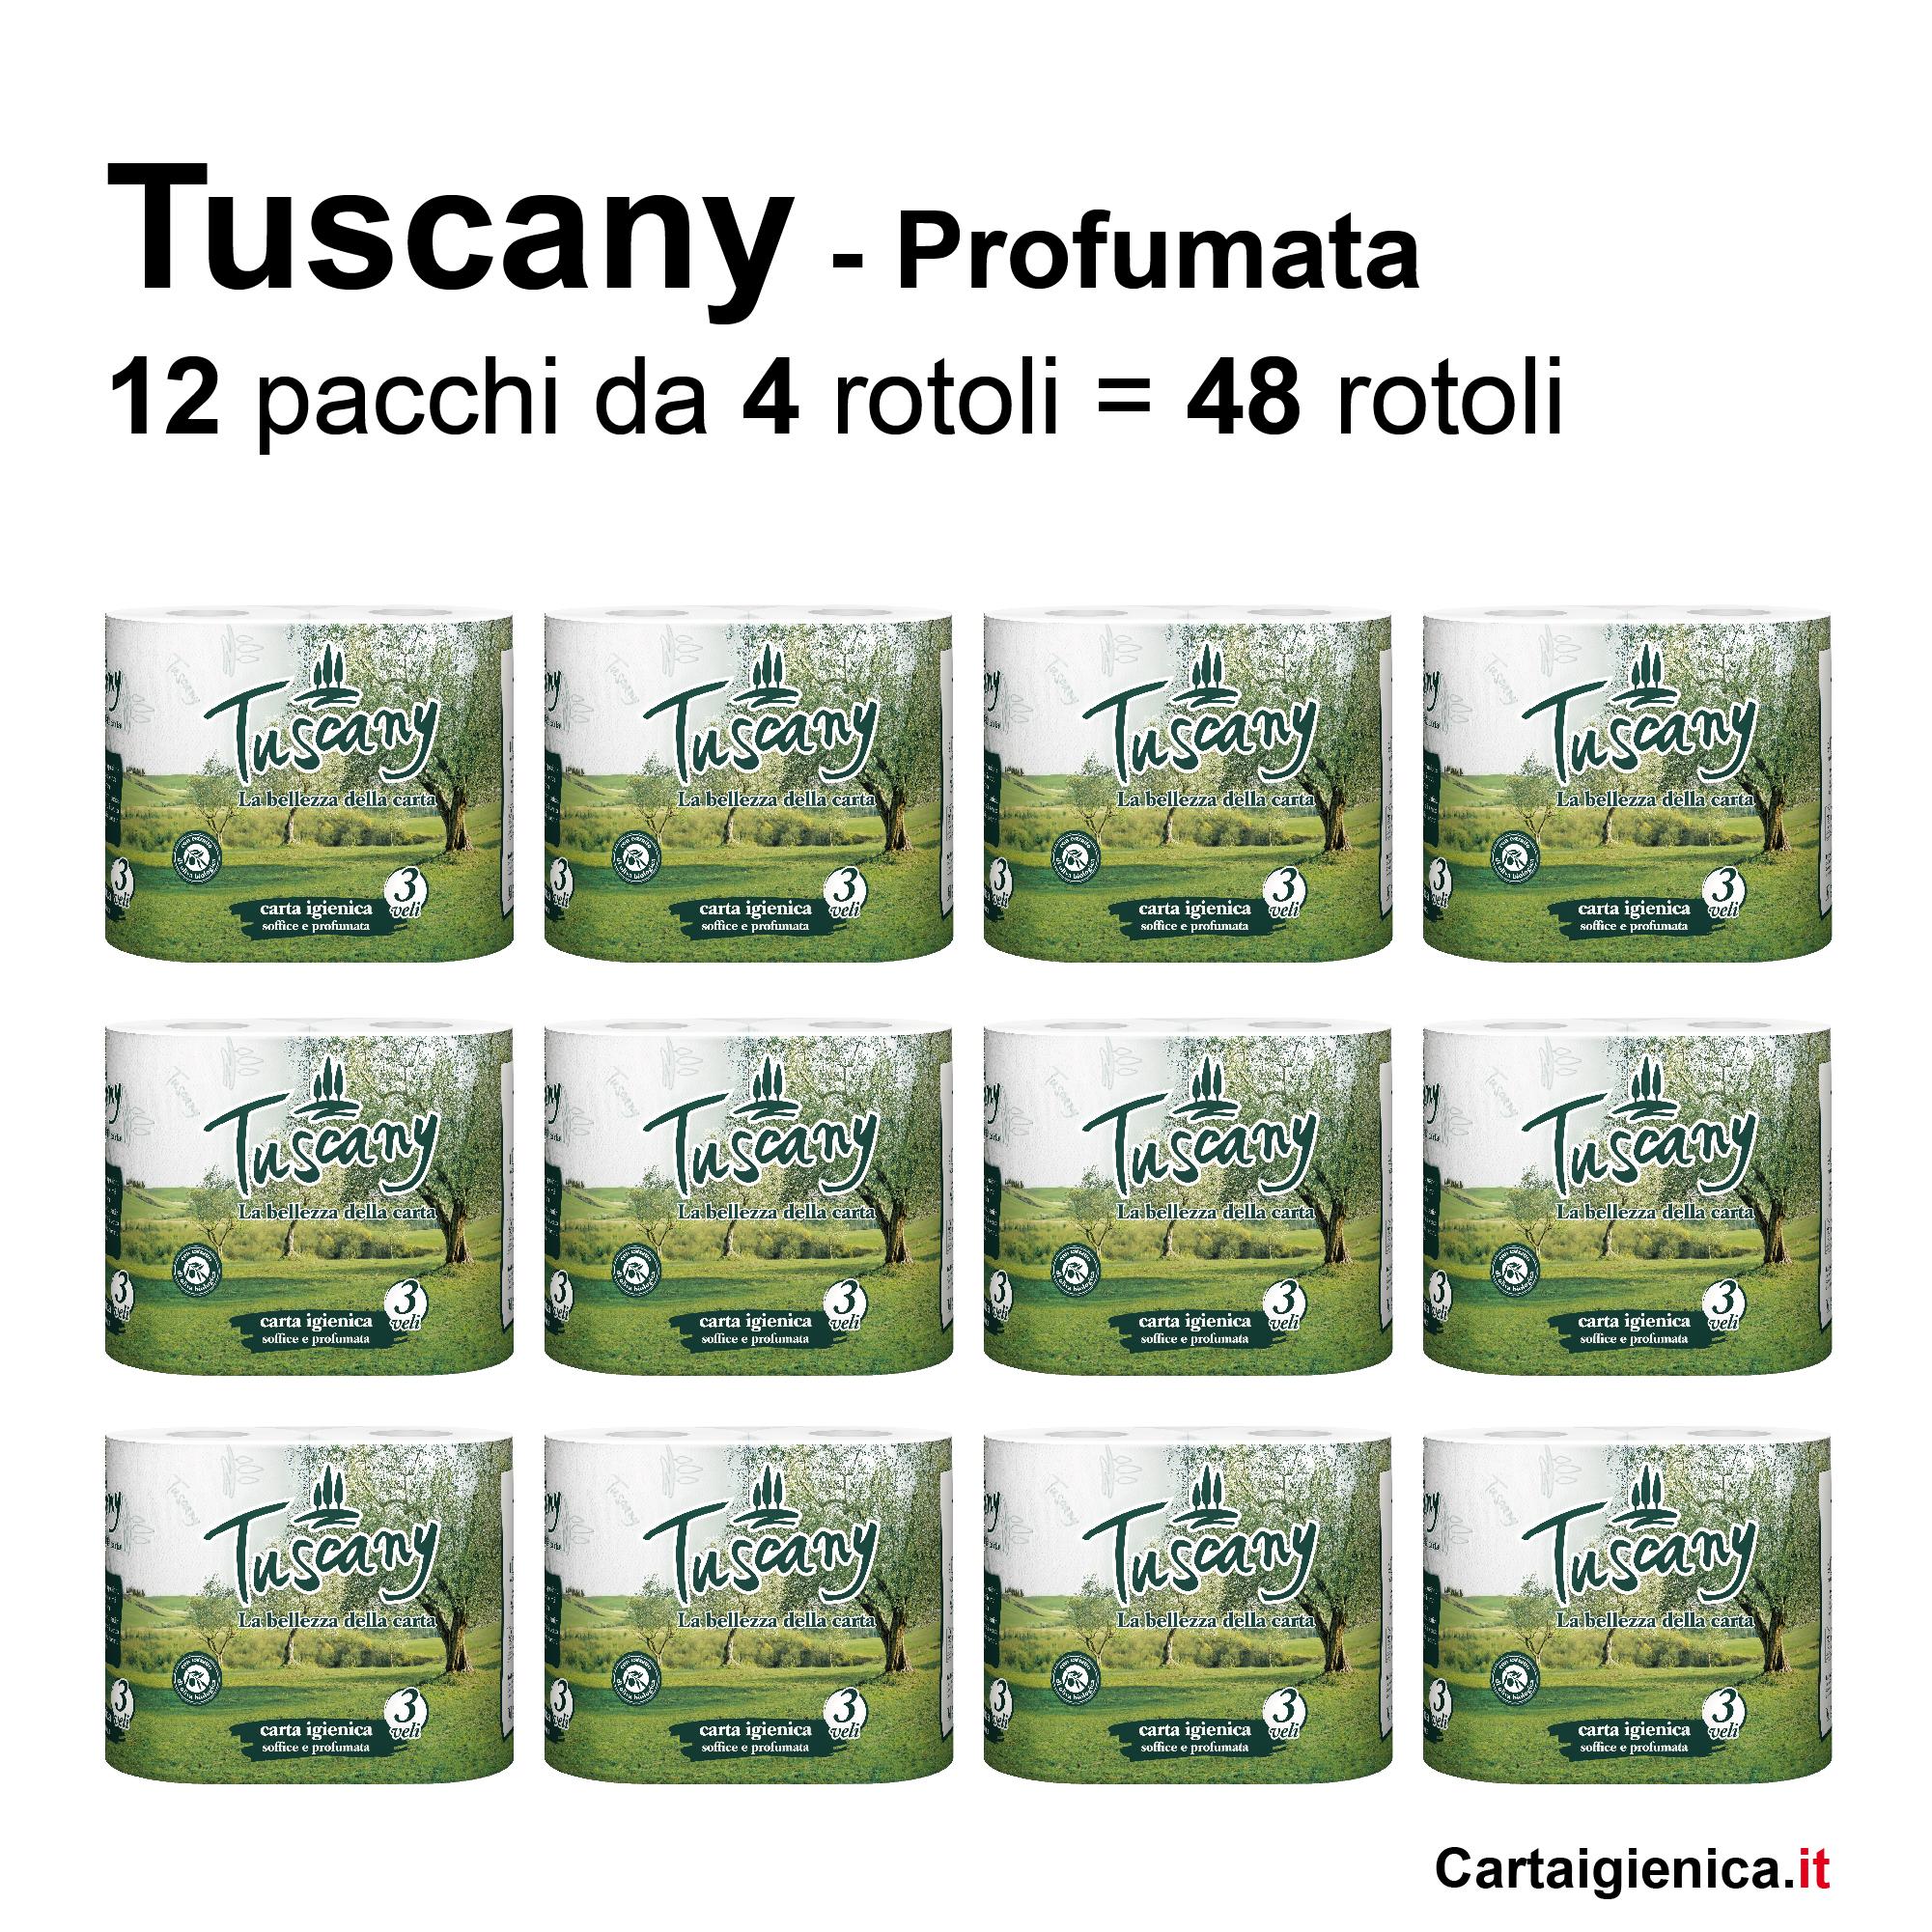 carta igienica tuscany profumata 4 rotoli offerta